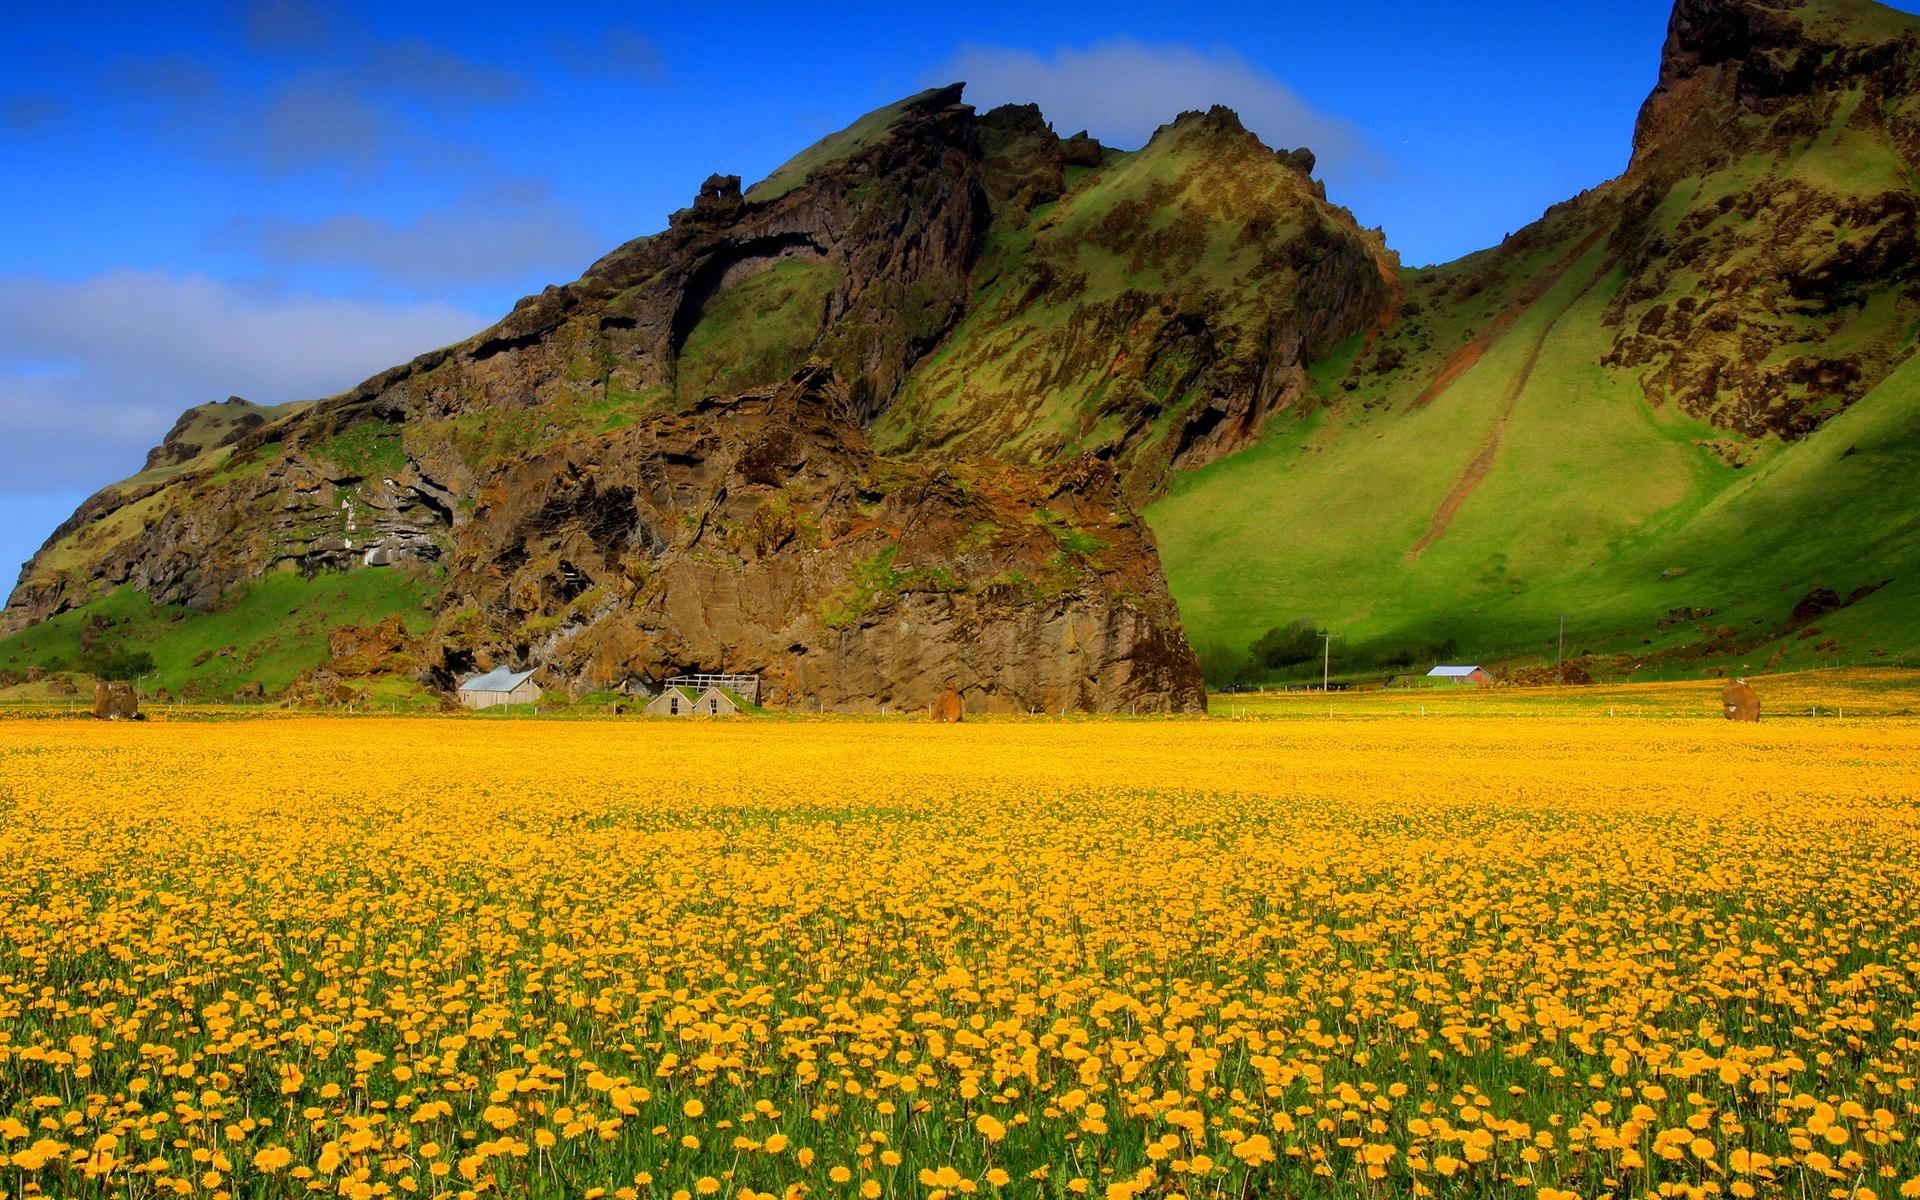 Yellow Flower Field Wallpaper 42771 1920x1200 px ...